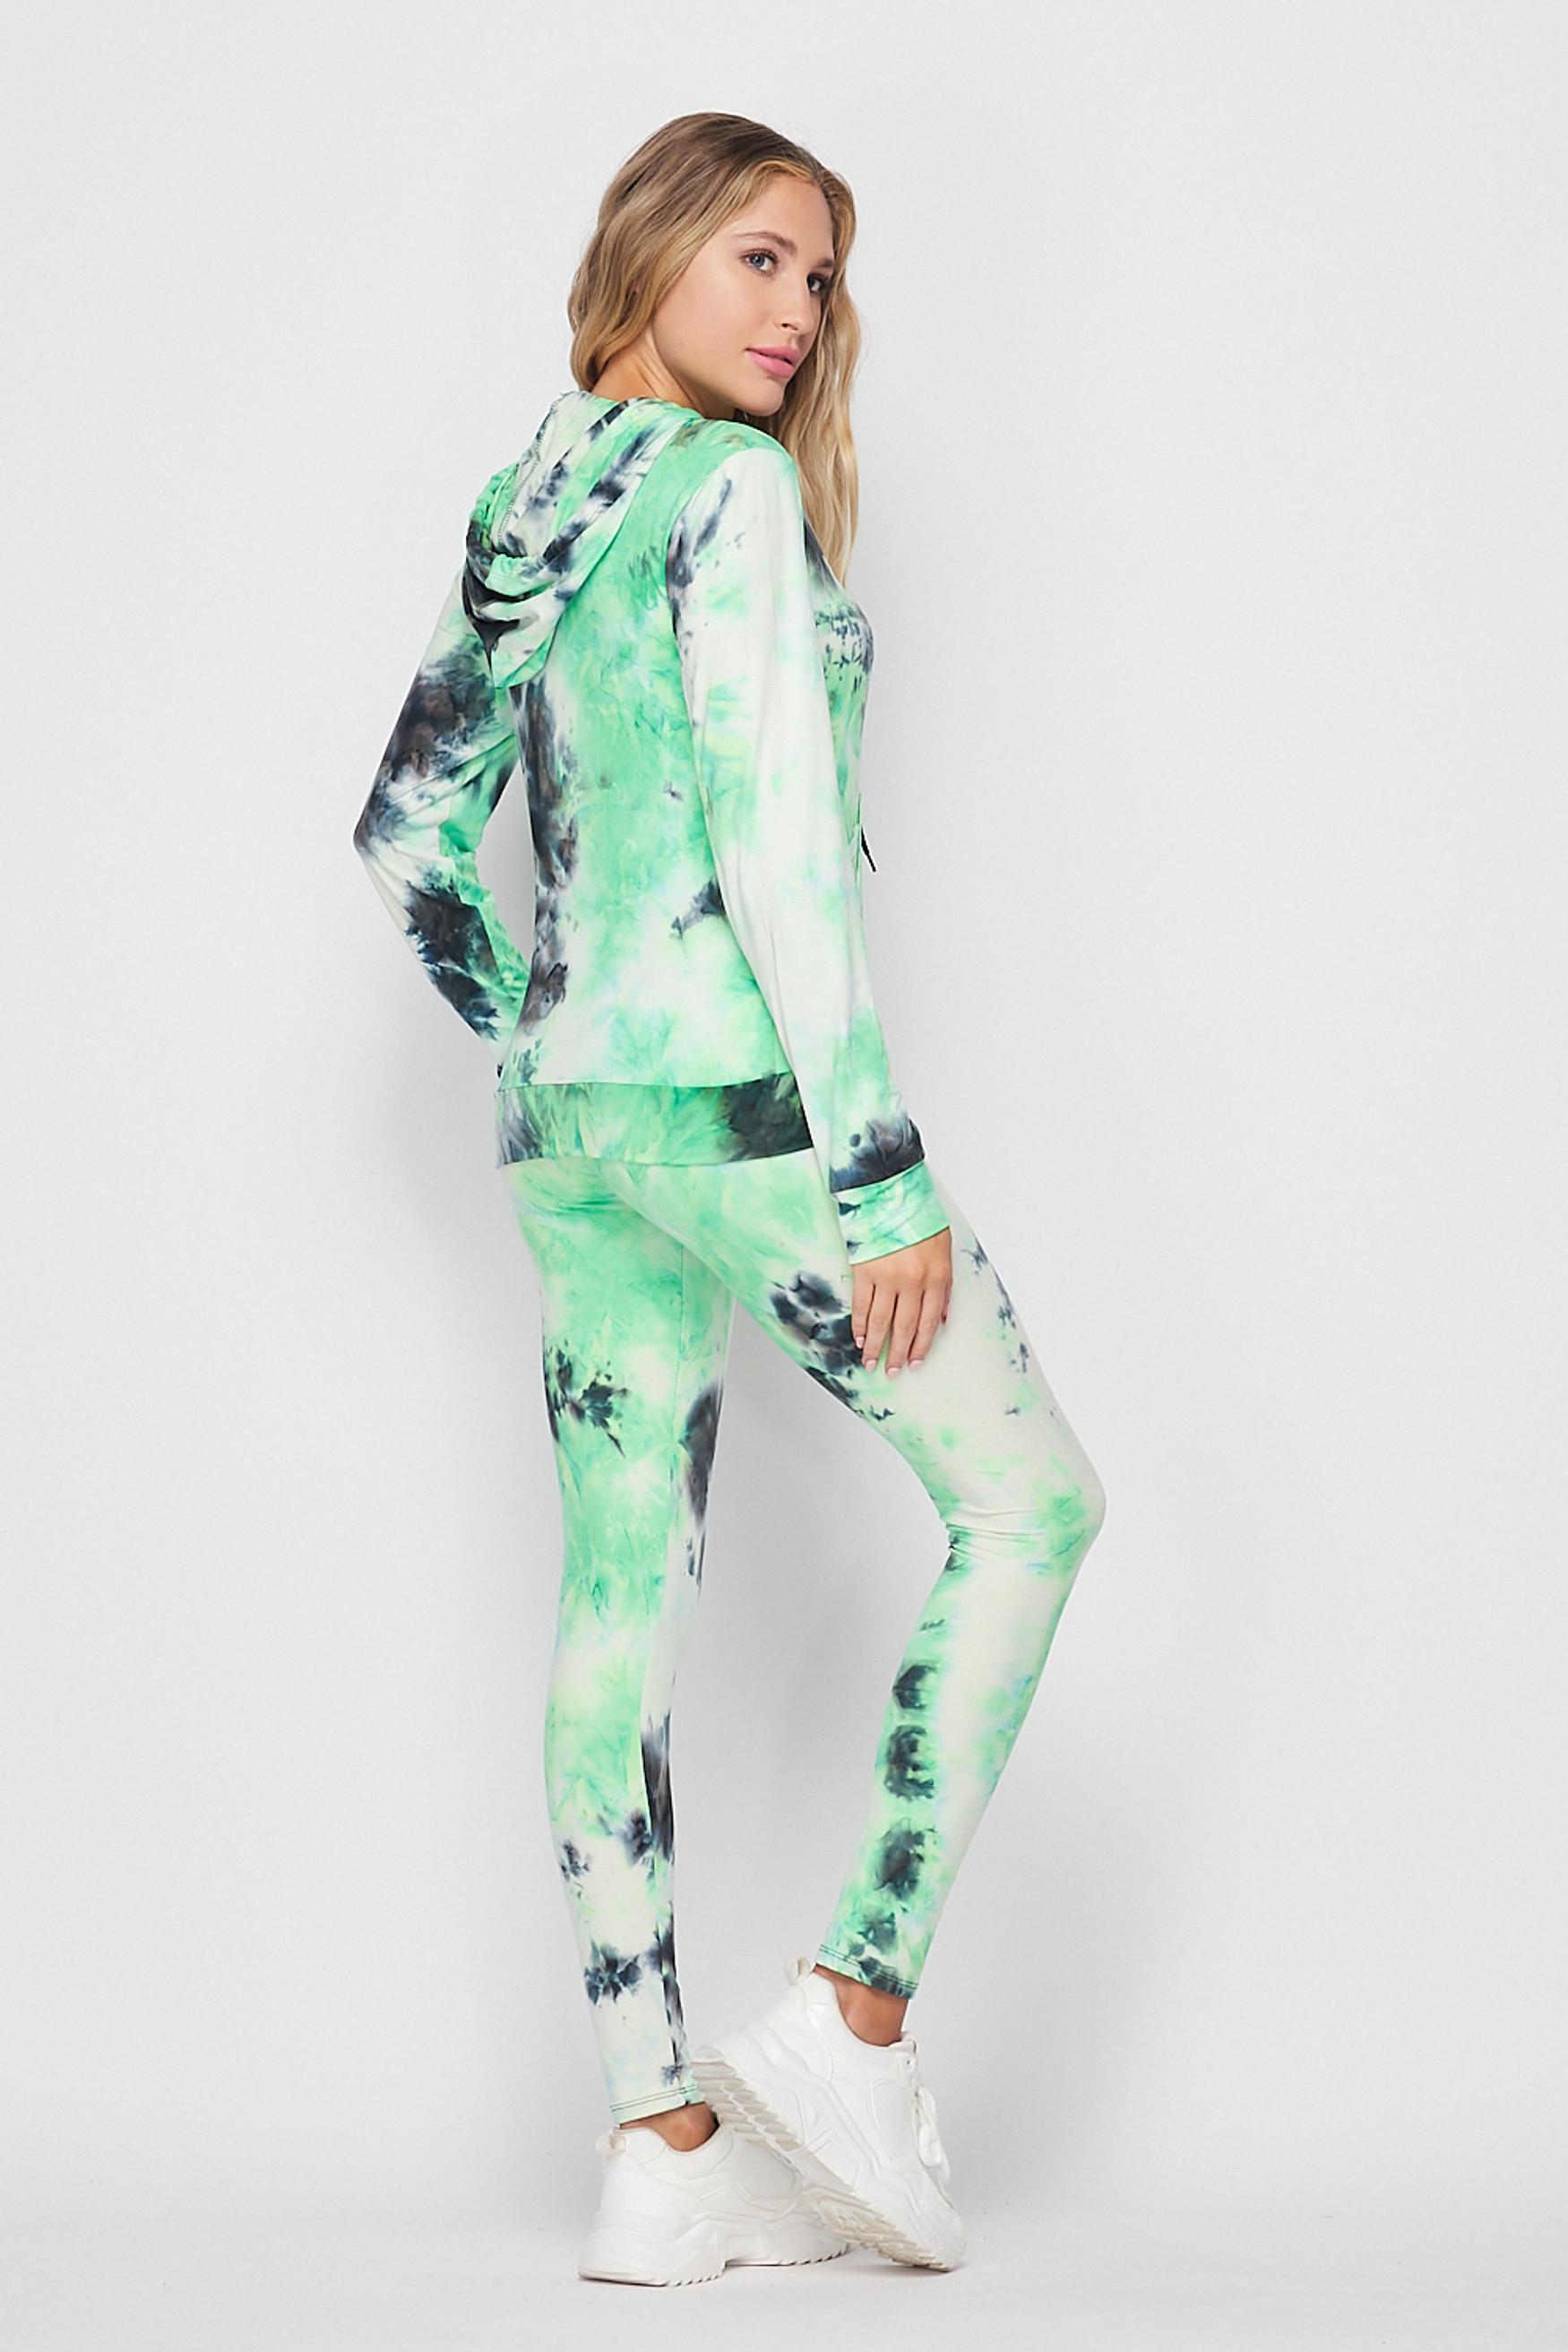 Green Tie Dye 2 Piece Leggings and Hooded Jacket Set